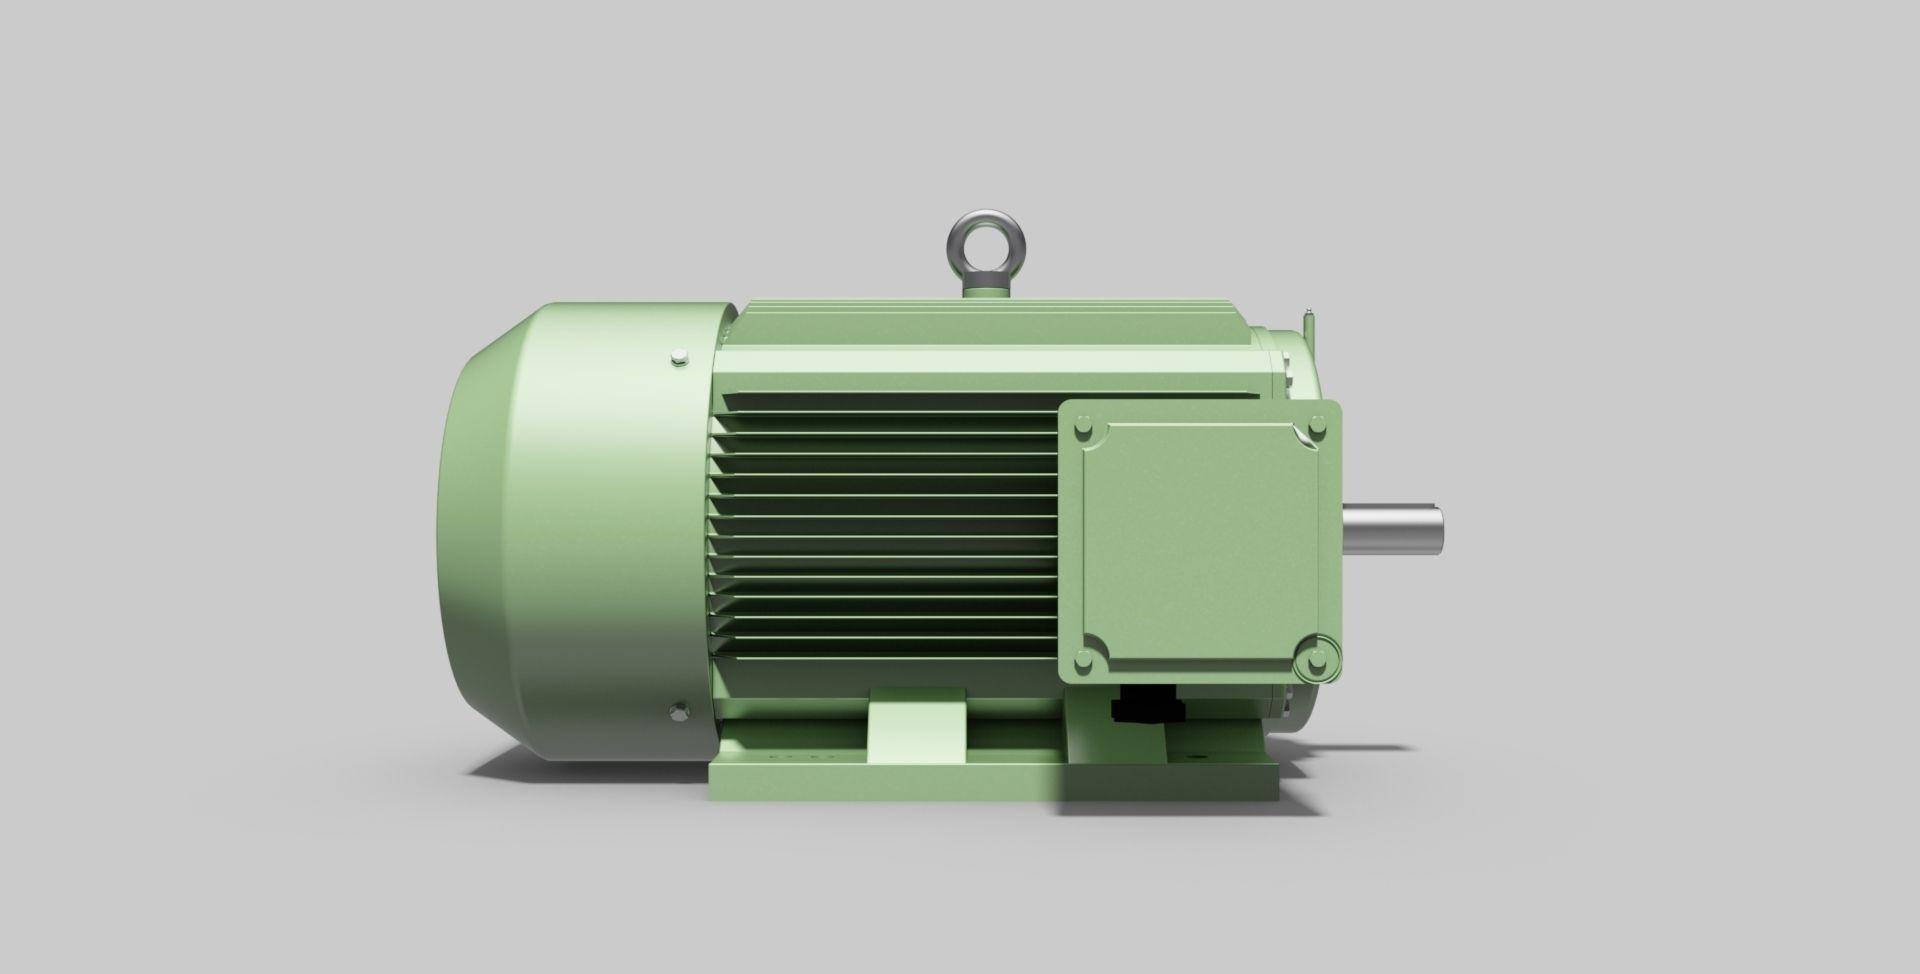 315M-B3 Left 2-Pole - Electric Motor - Free 3D CAD Model free 3D